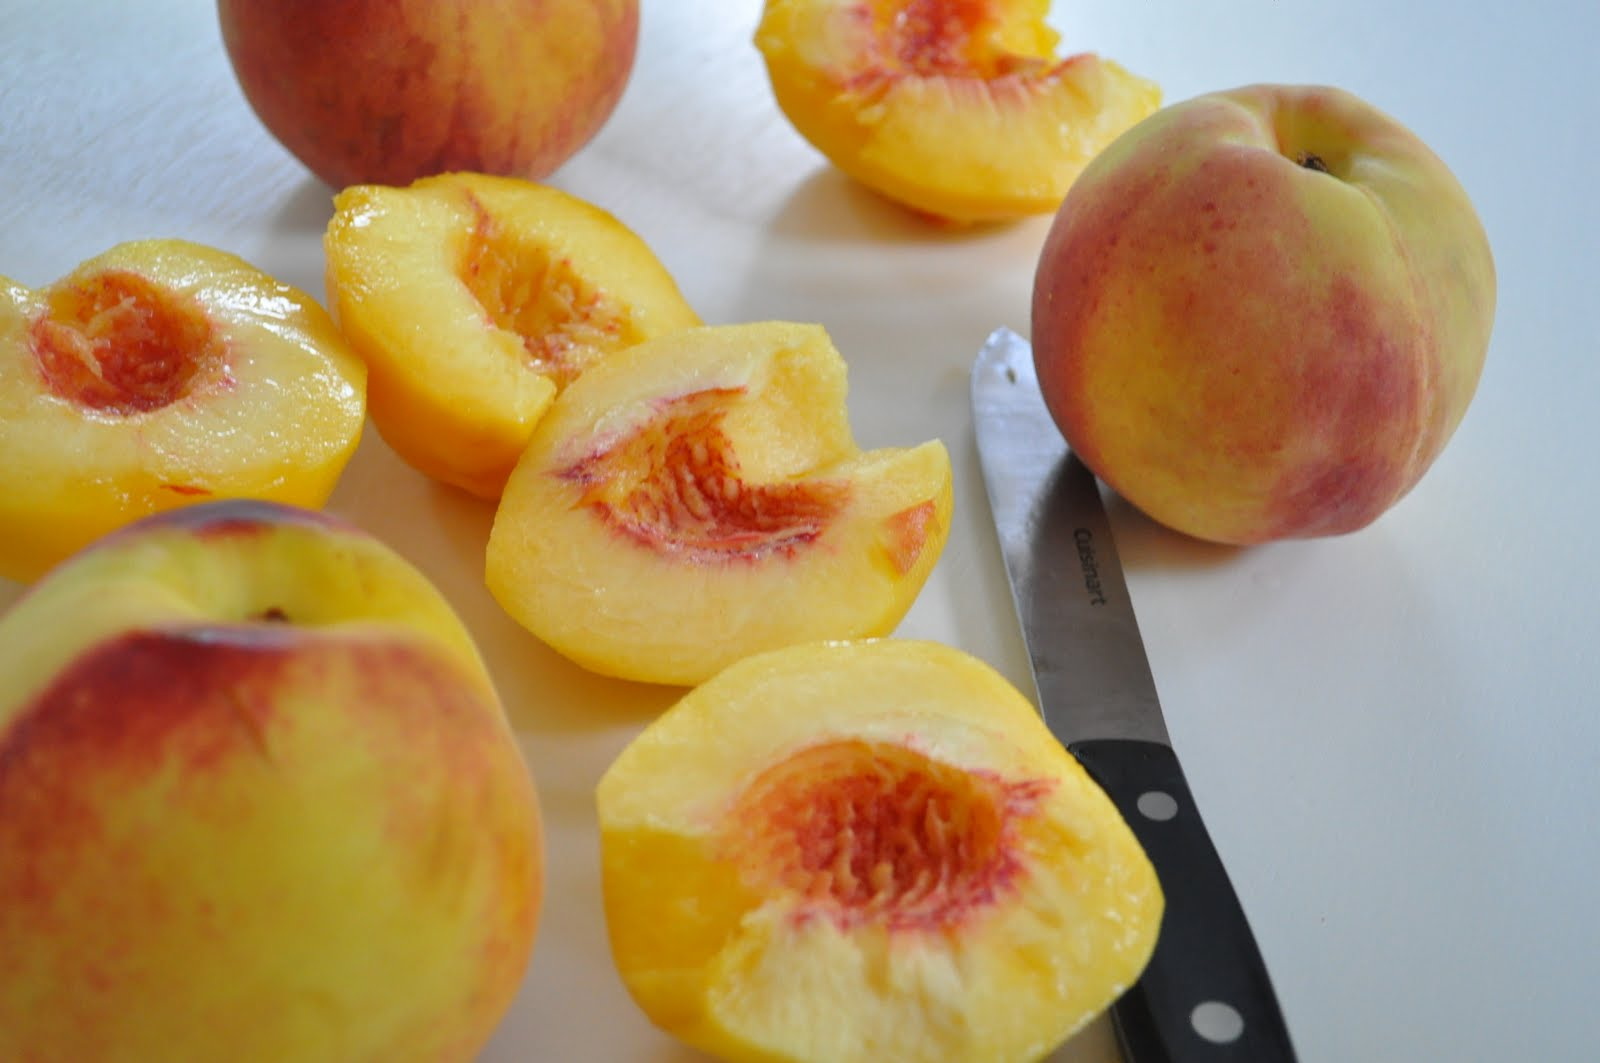 Kneading My Dream: Peach Tart with Mascarpone Cream